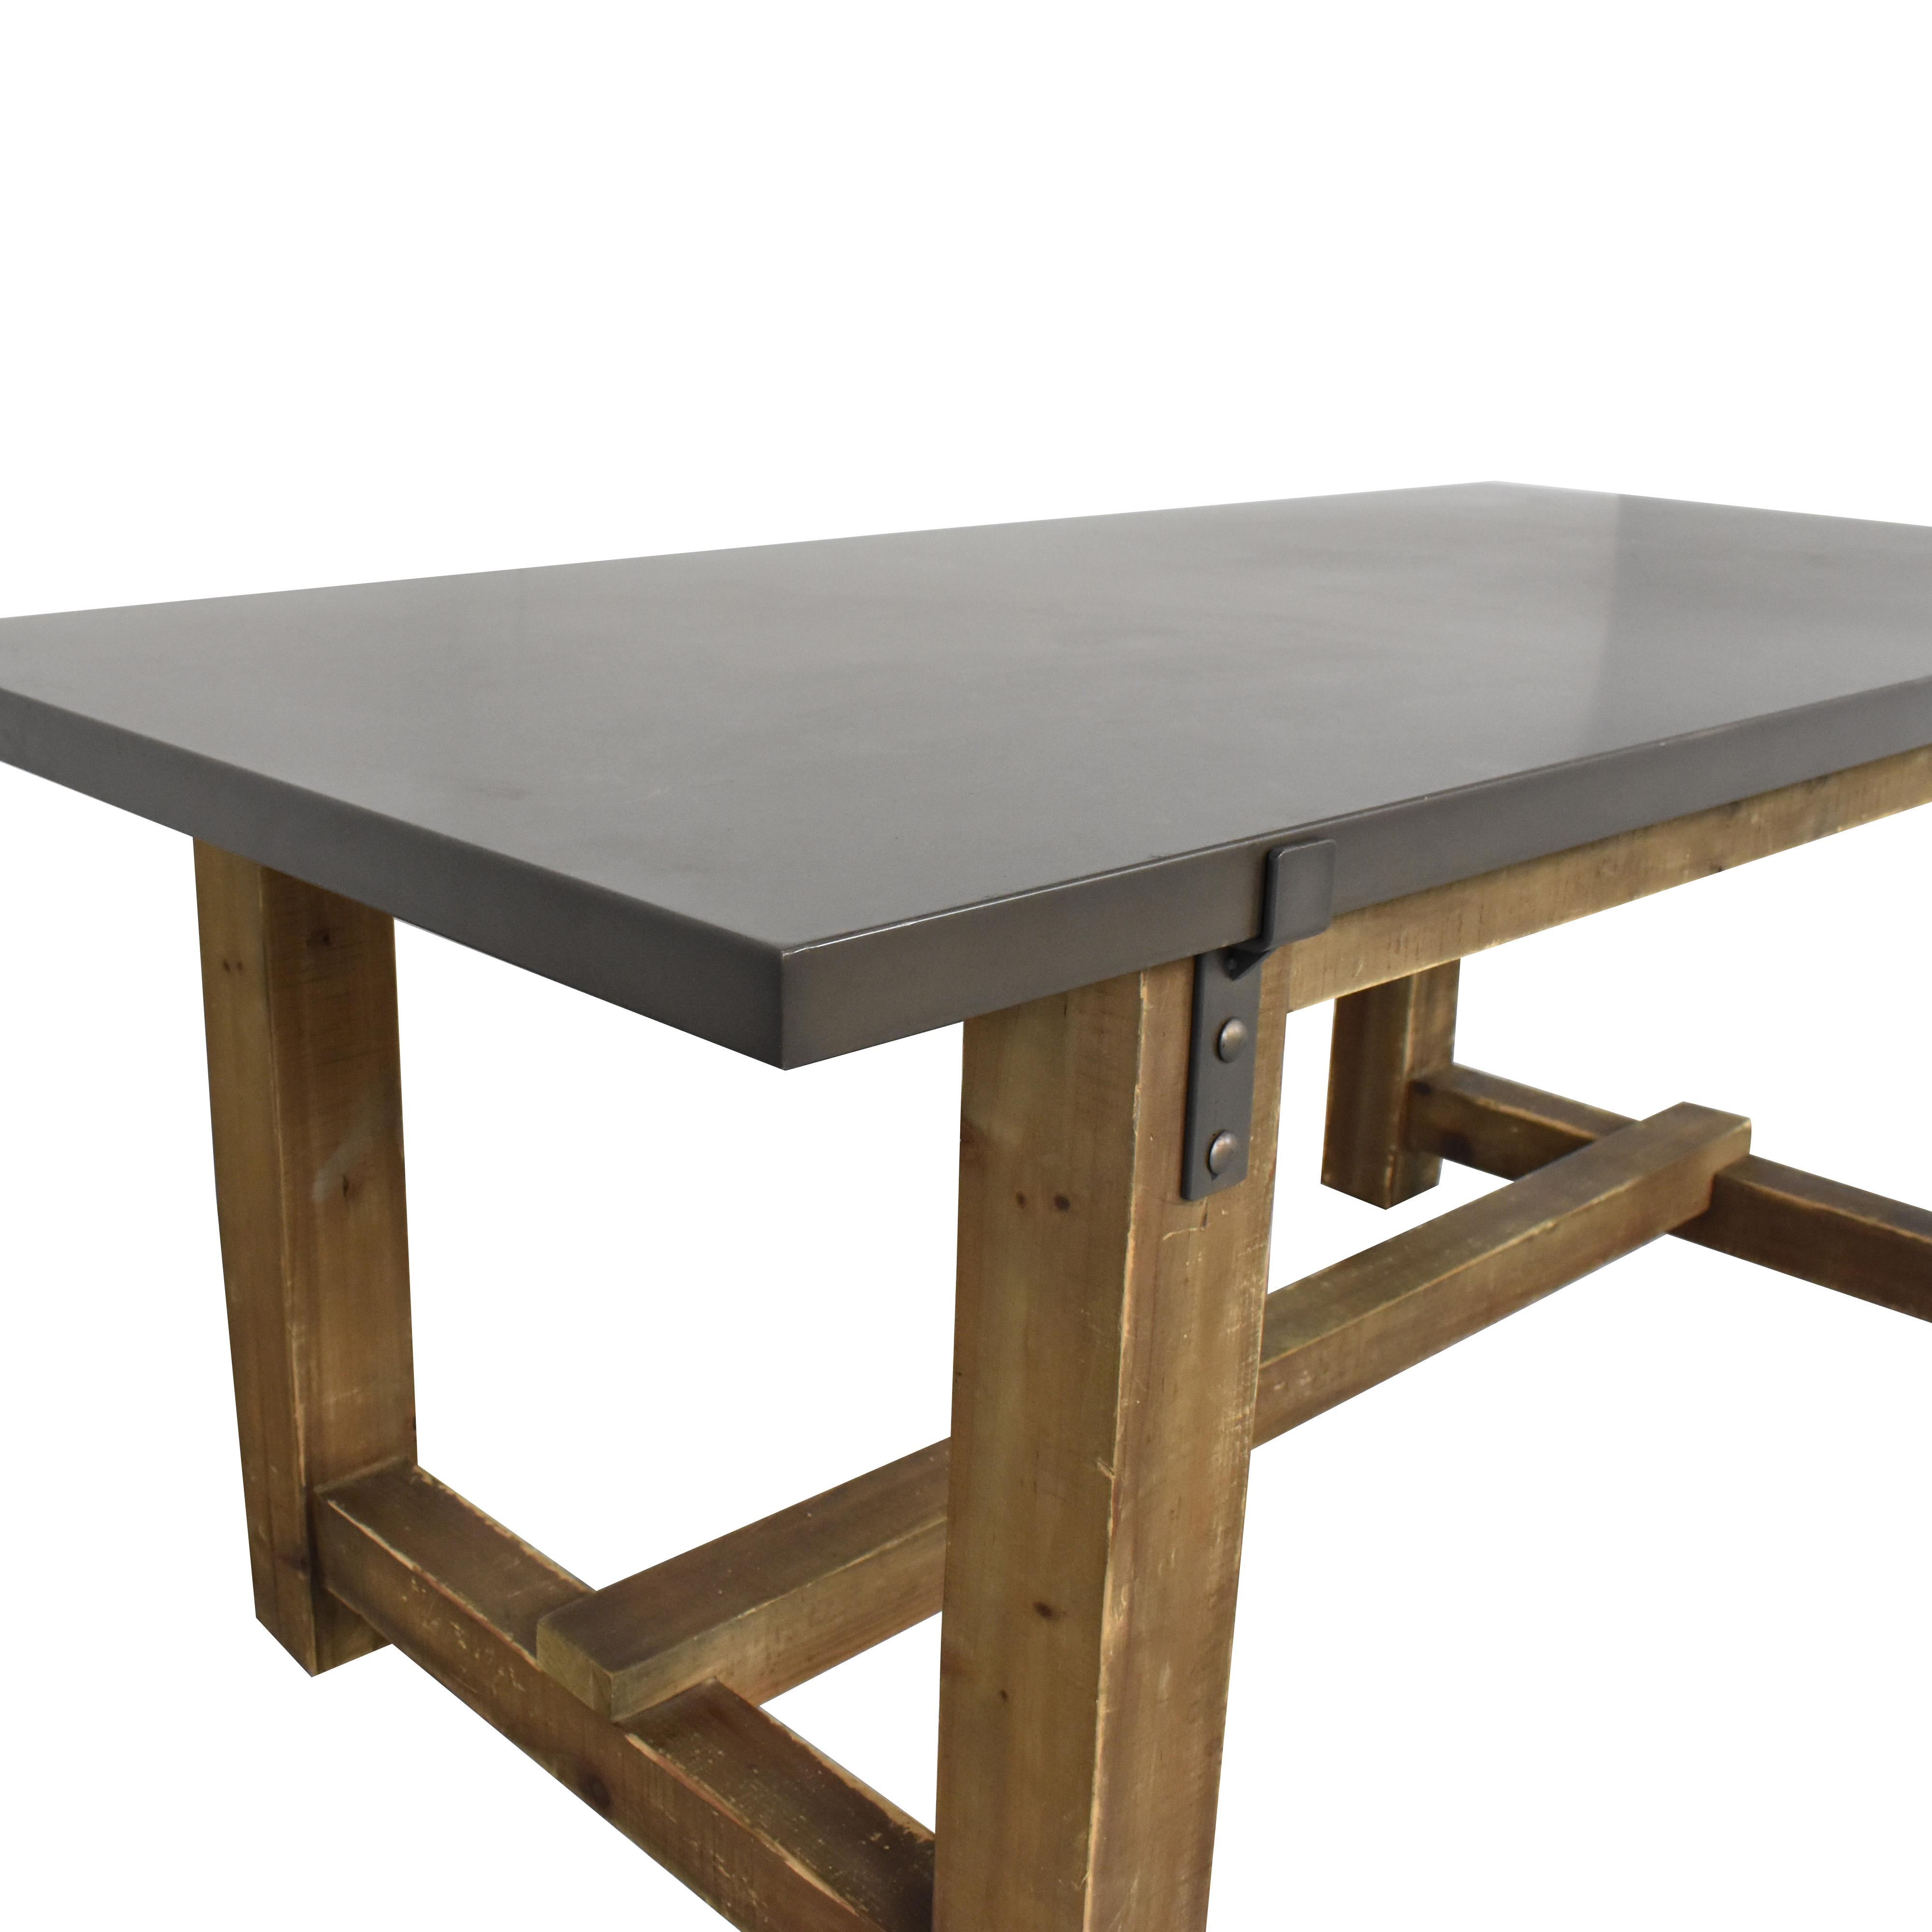 Restoration Hardware Restoration Hardware Reclaimed Wood & Zinc-Top Rectangular Dining Table Dinner Tables